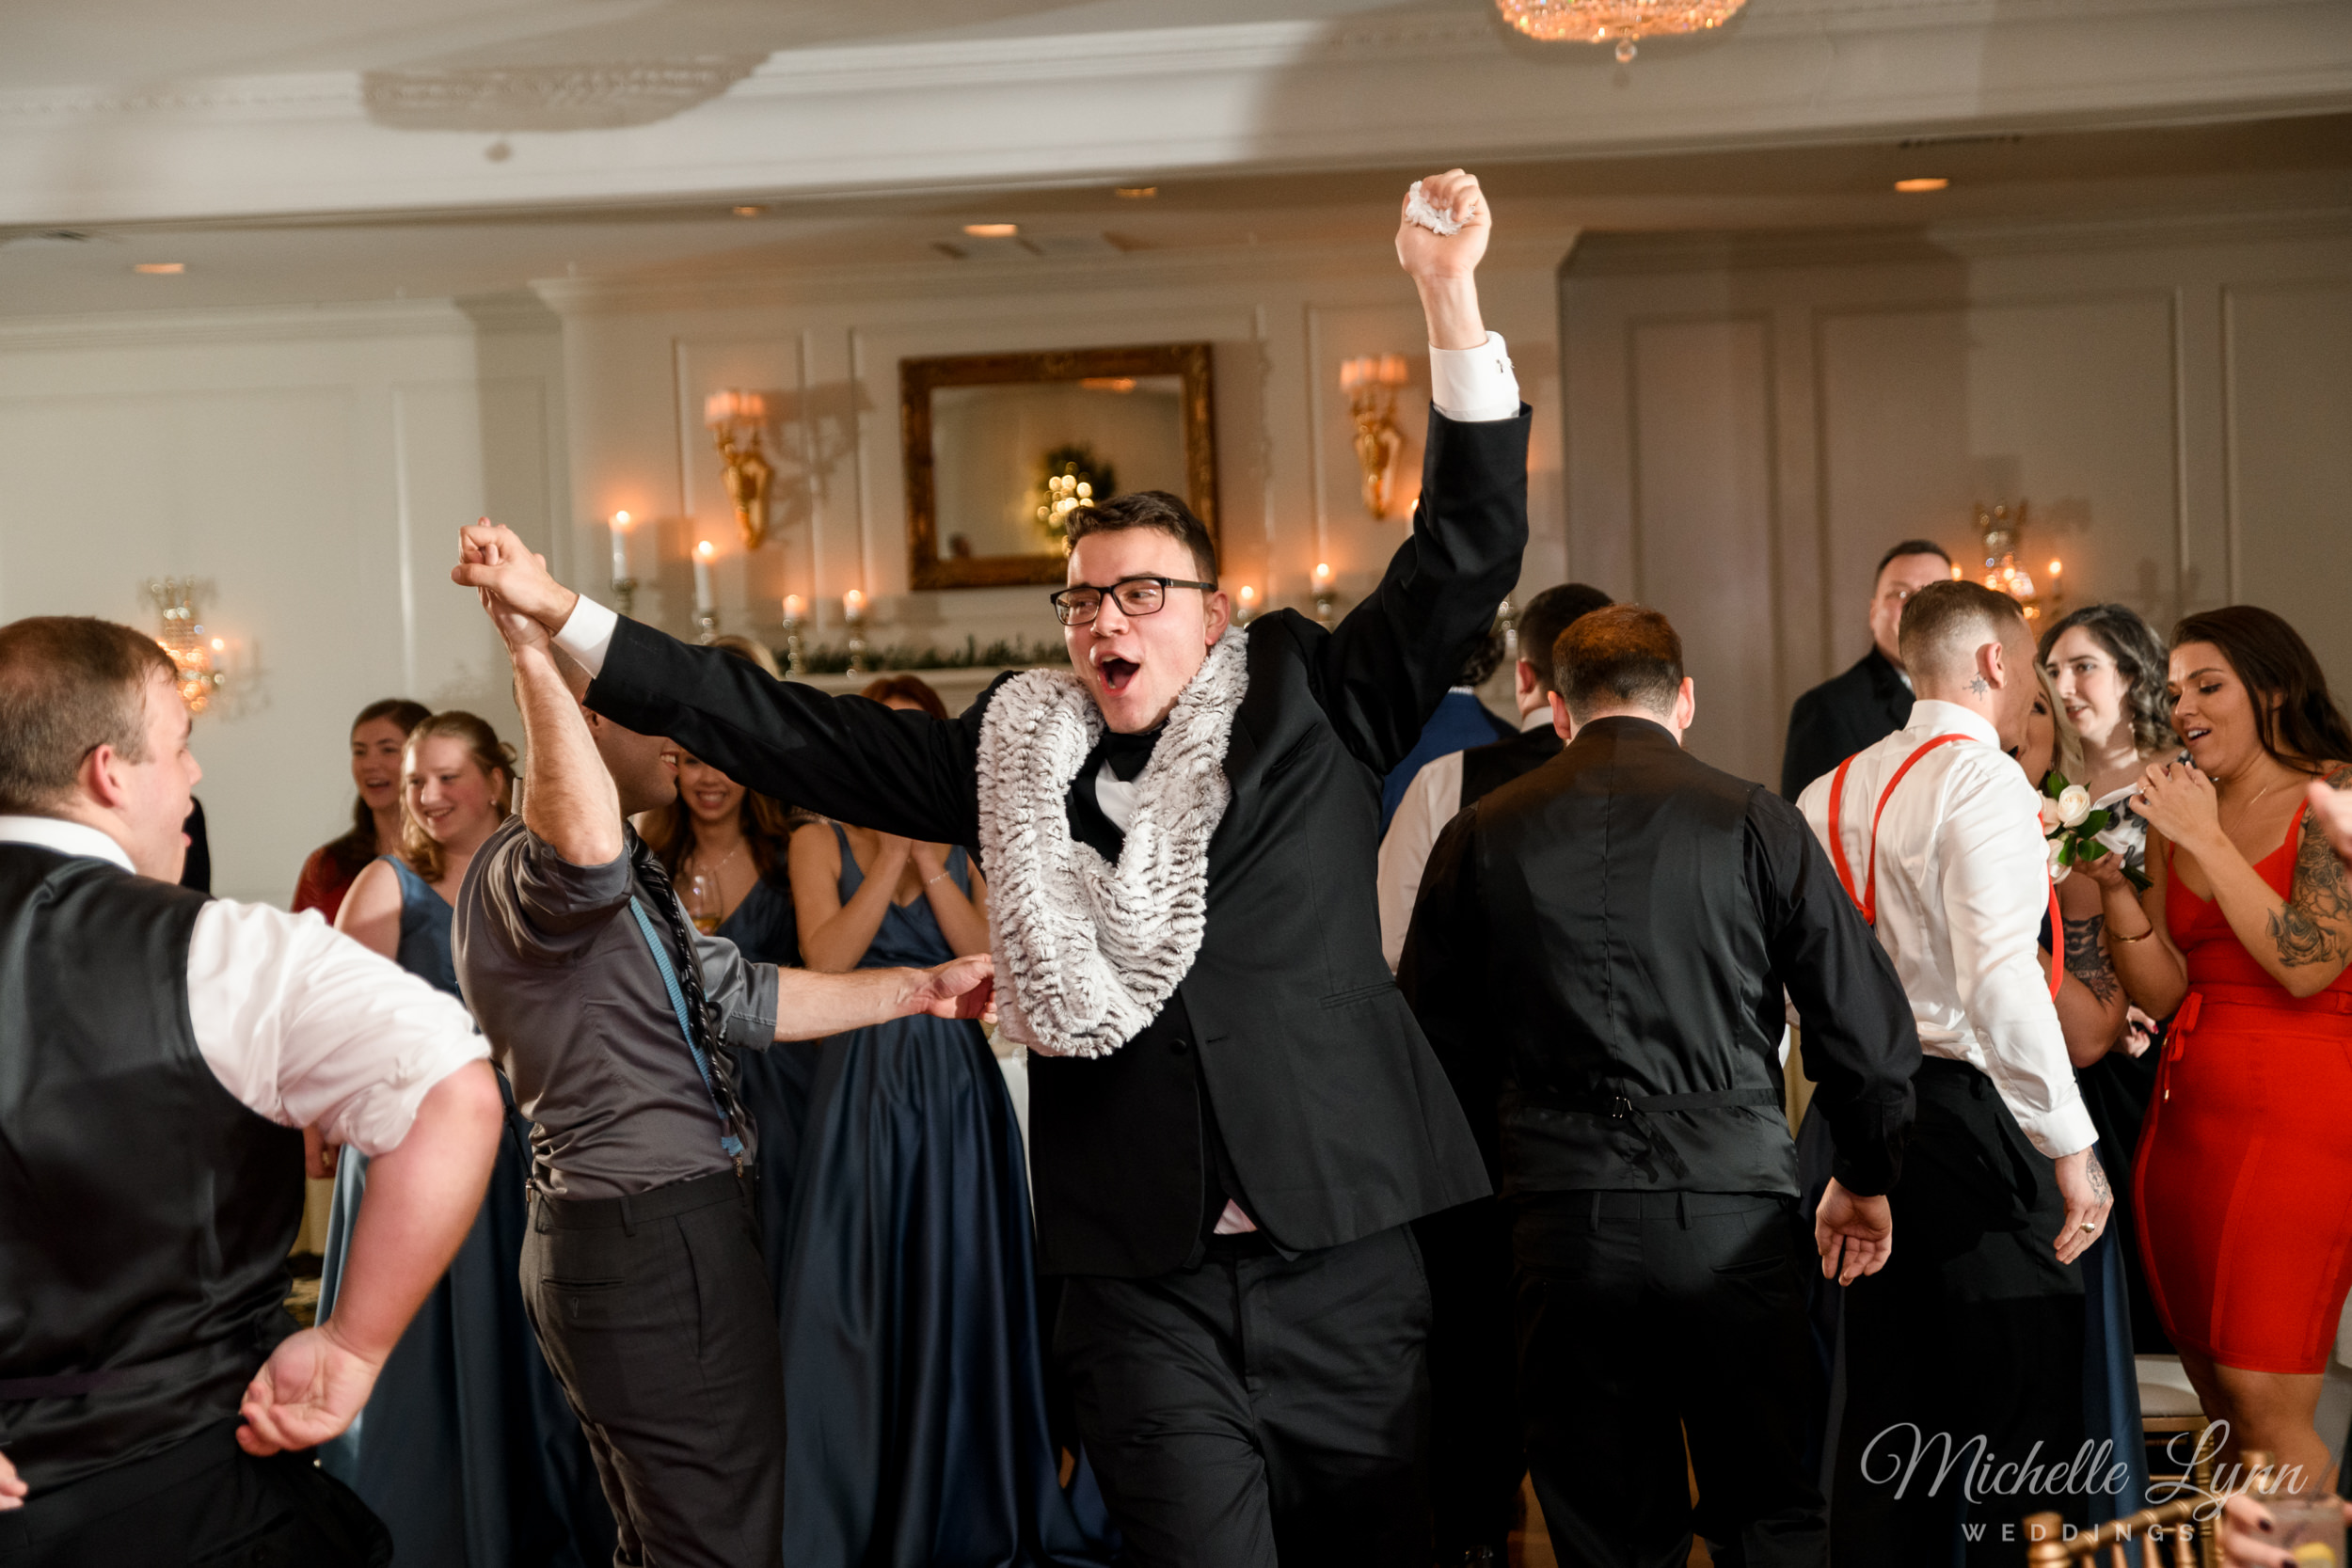 william-penn-inn-wedding-photography-mlw-116.jpg